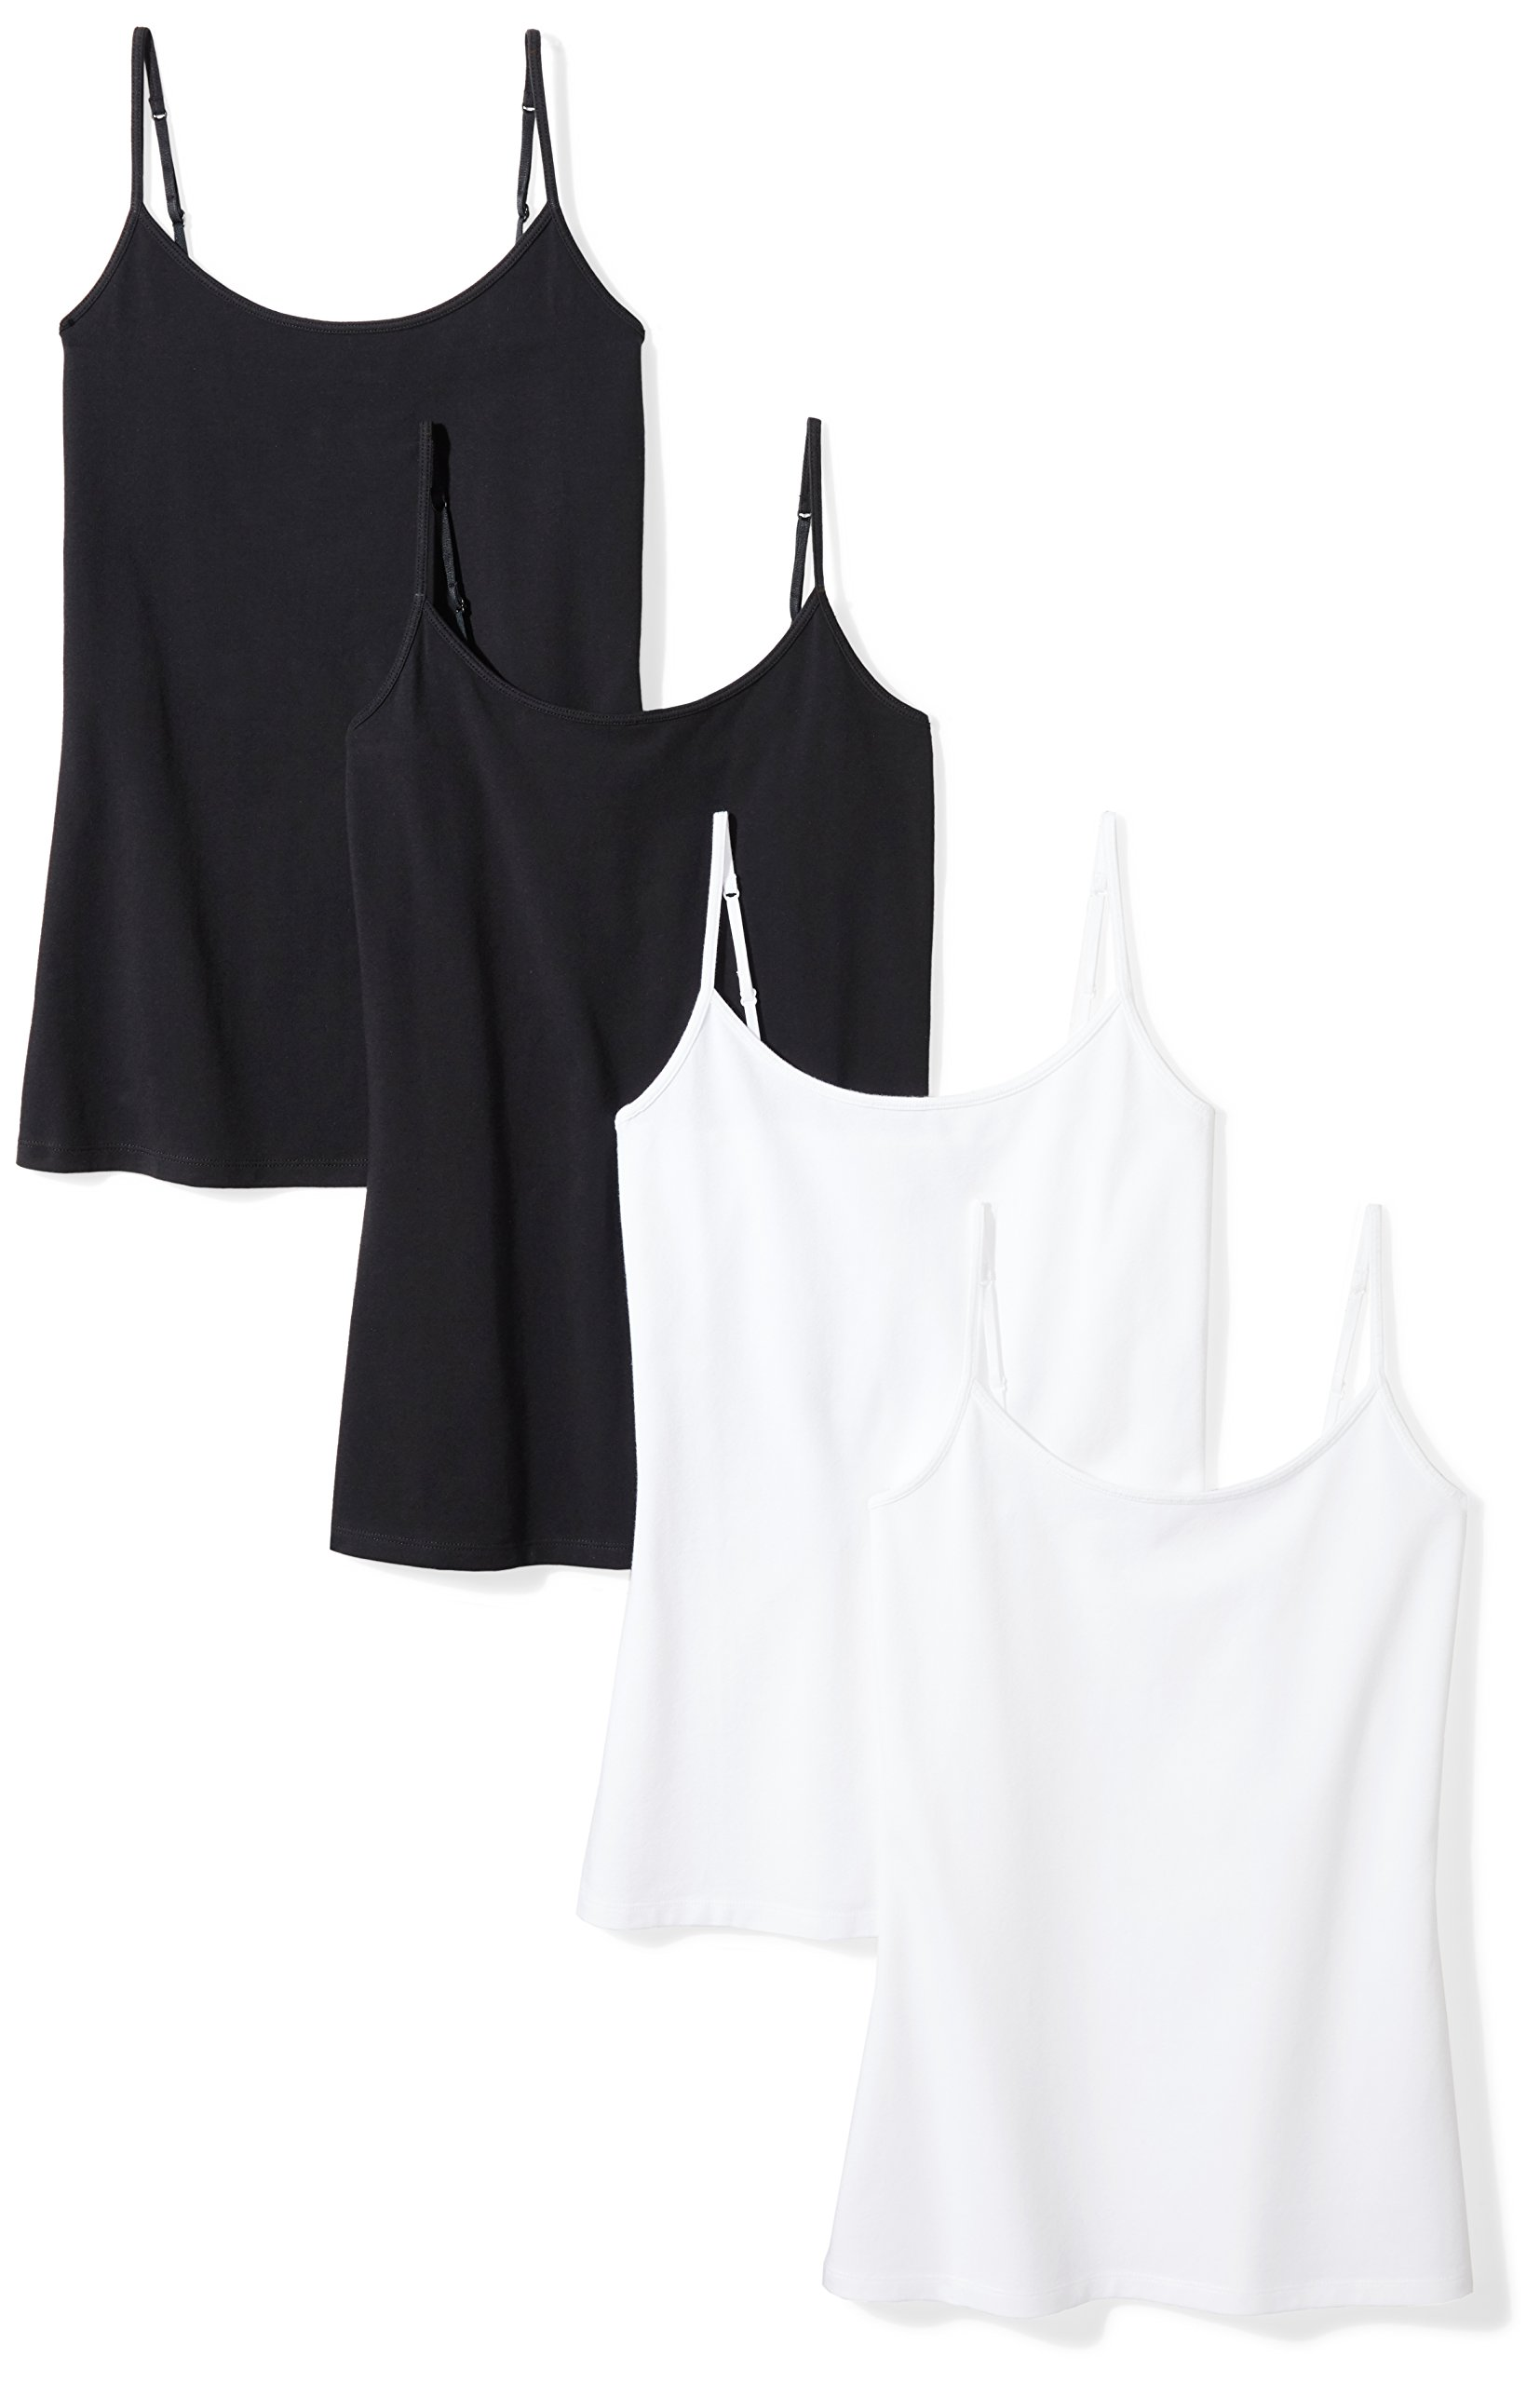 Amazon Essentials Women's 4-Pack Camisole, Black/Black/White/White, Small